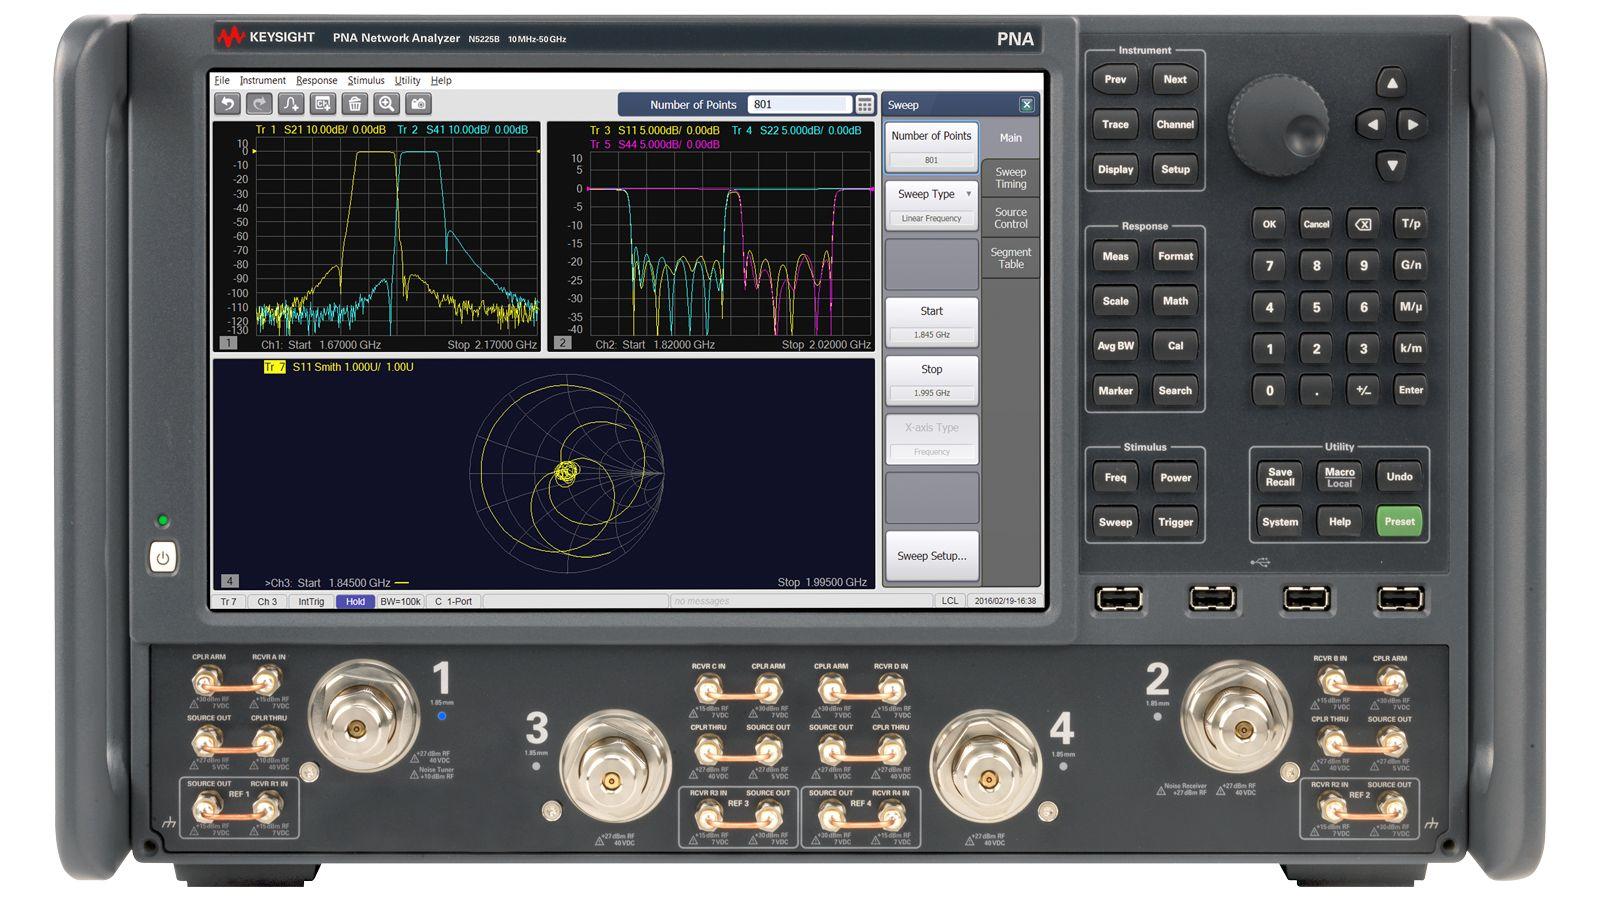 Keysight N5225B PNA网络分析仪